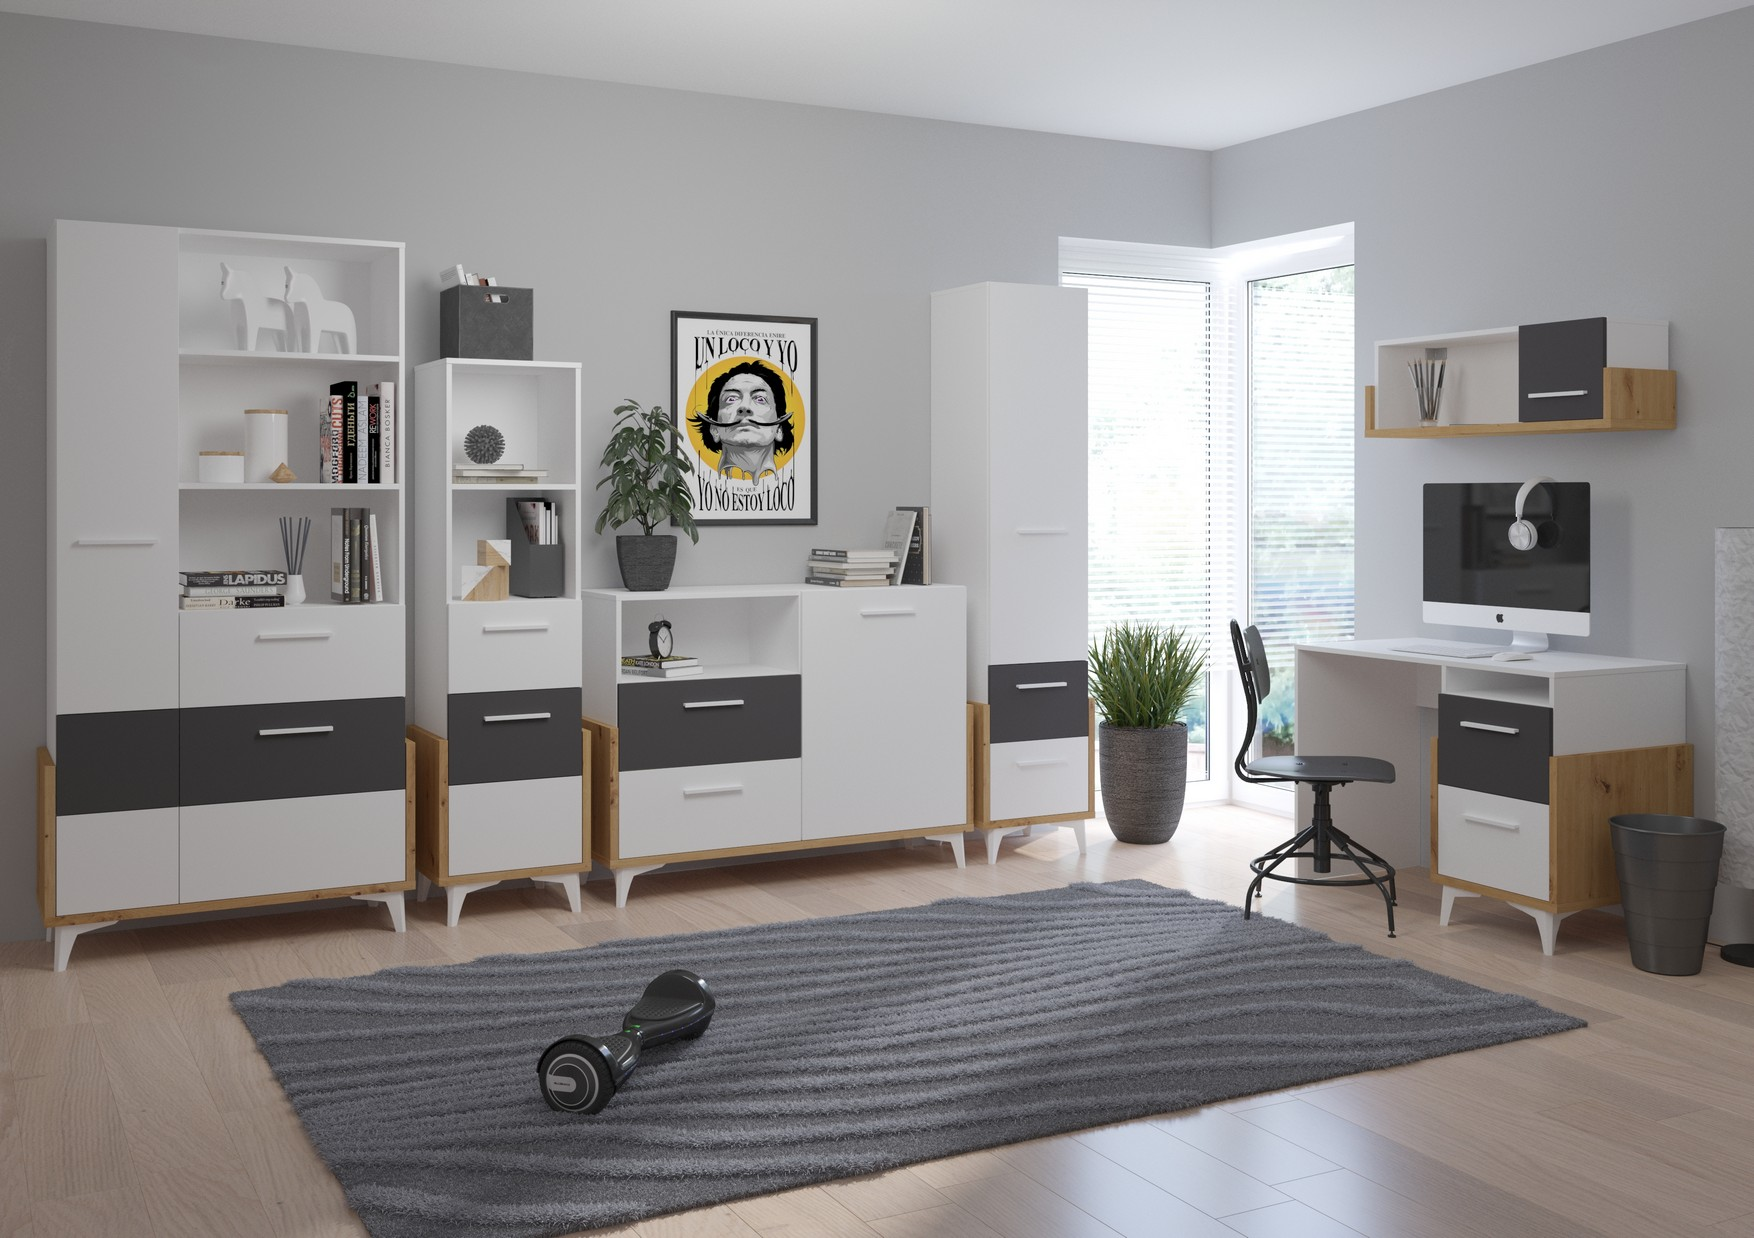 WIP Detská izba HEY 2 Farba: Dub artisan/biela/grafit